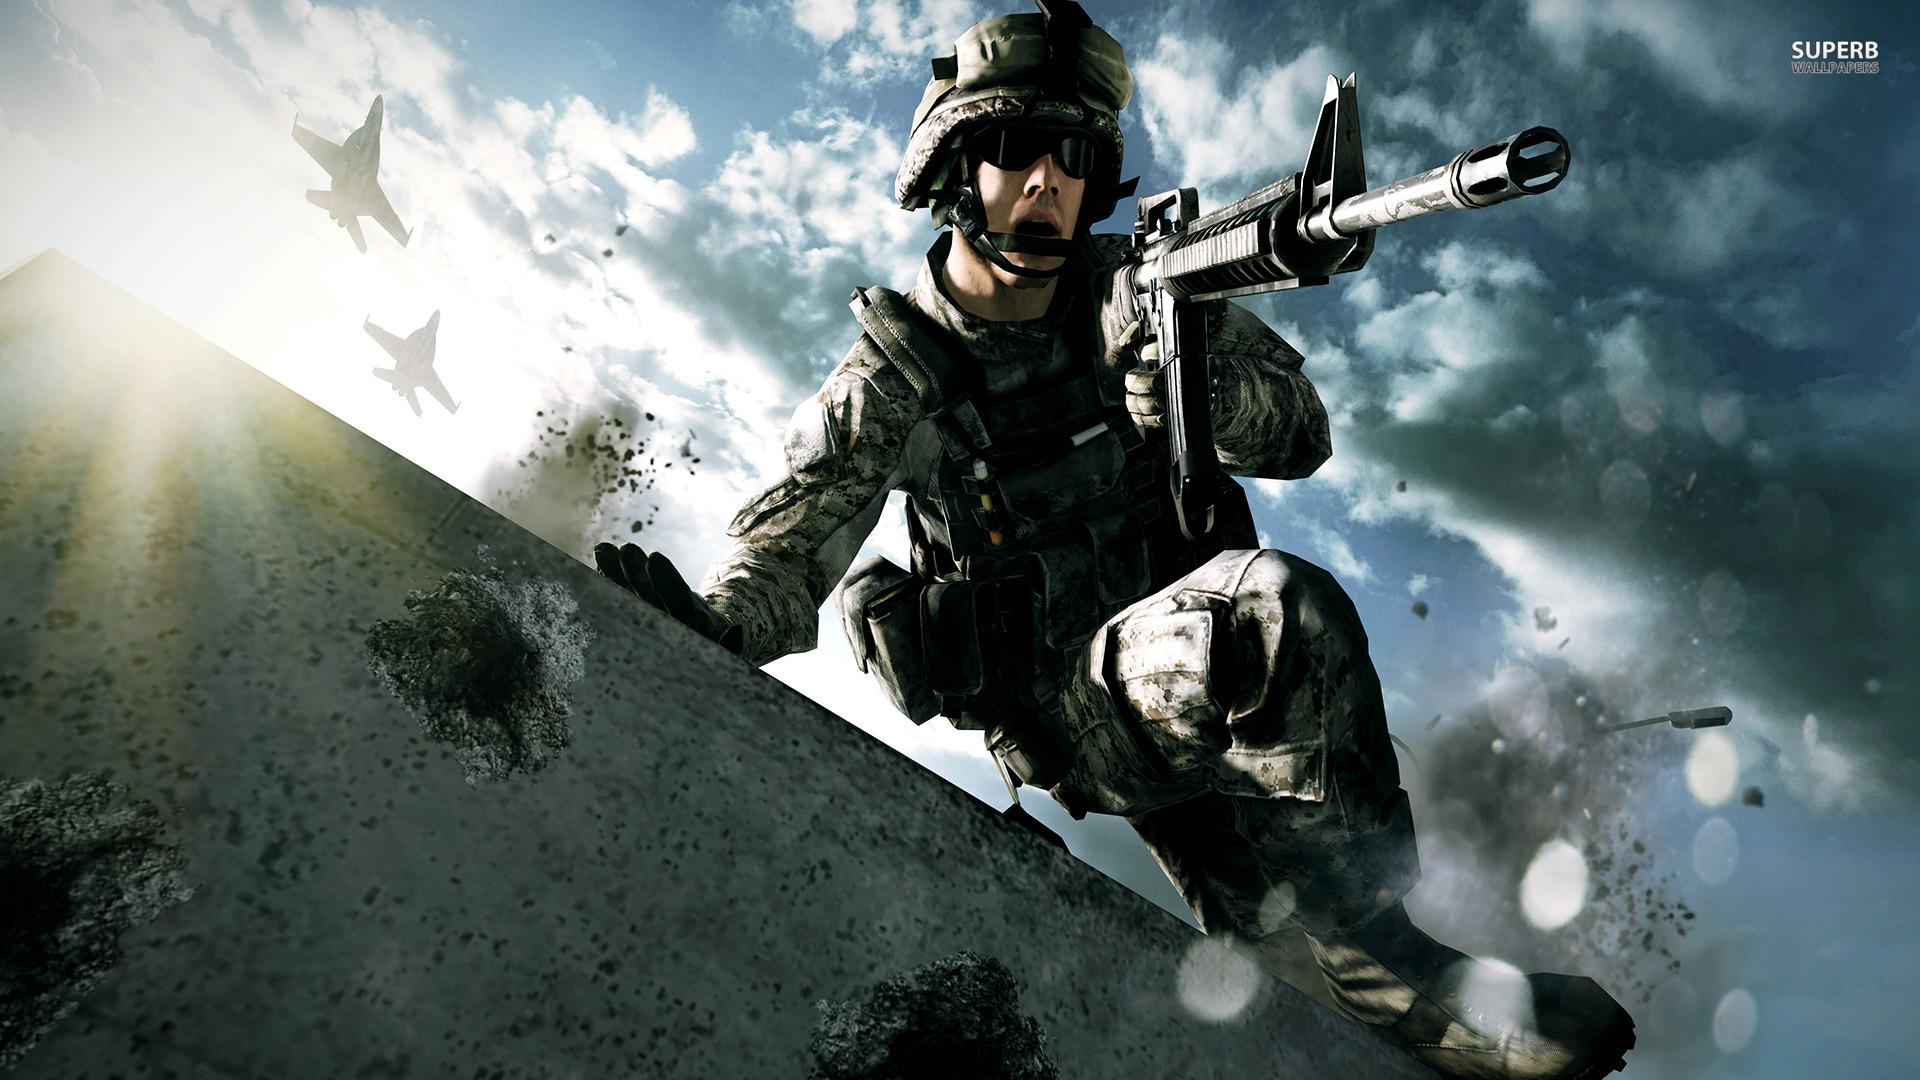 HD Battlefield 4 Wallpaper - WallpaperSafari